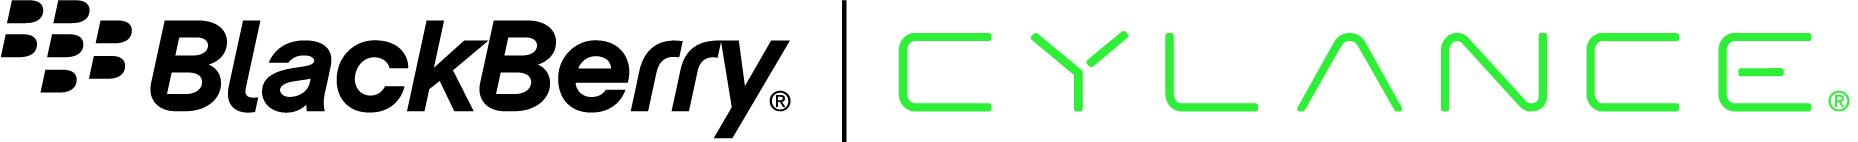 Cylance_BB_Logo_RGB_Horz_Black.jpg